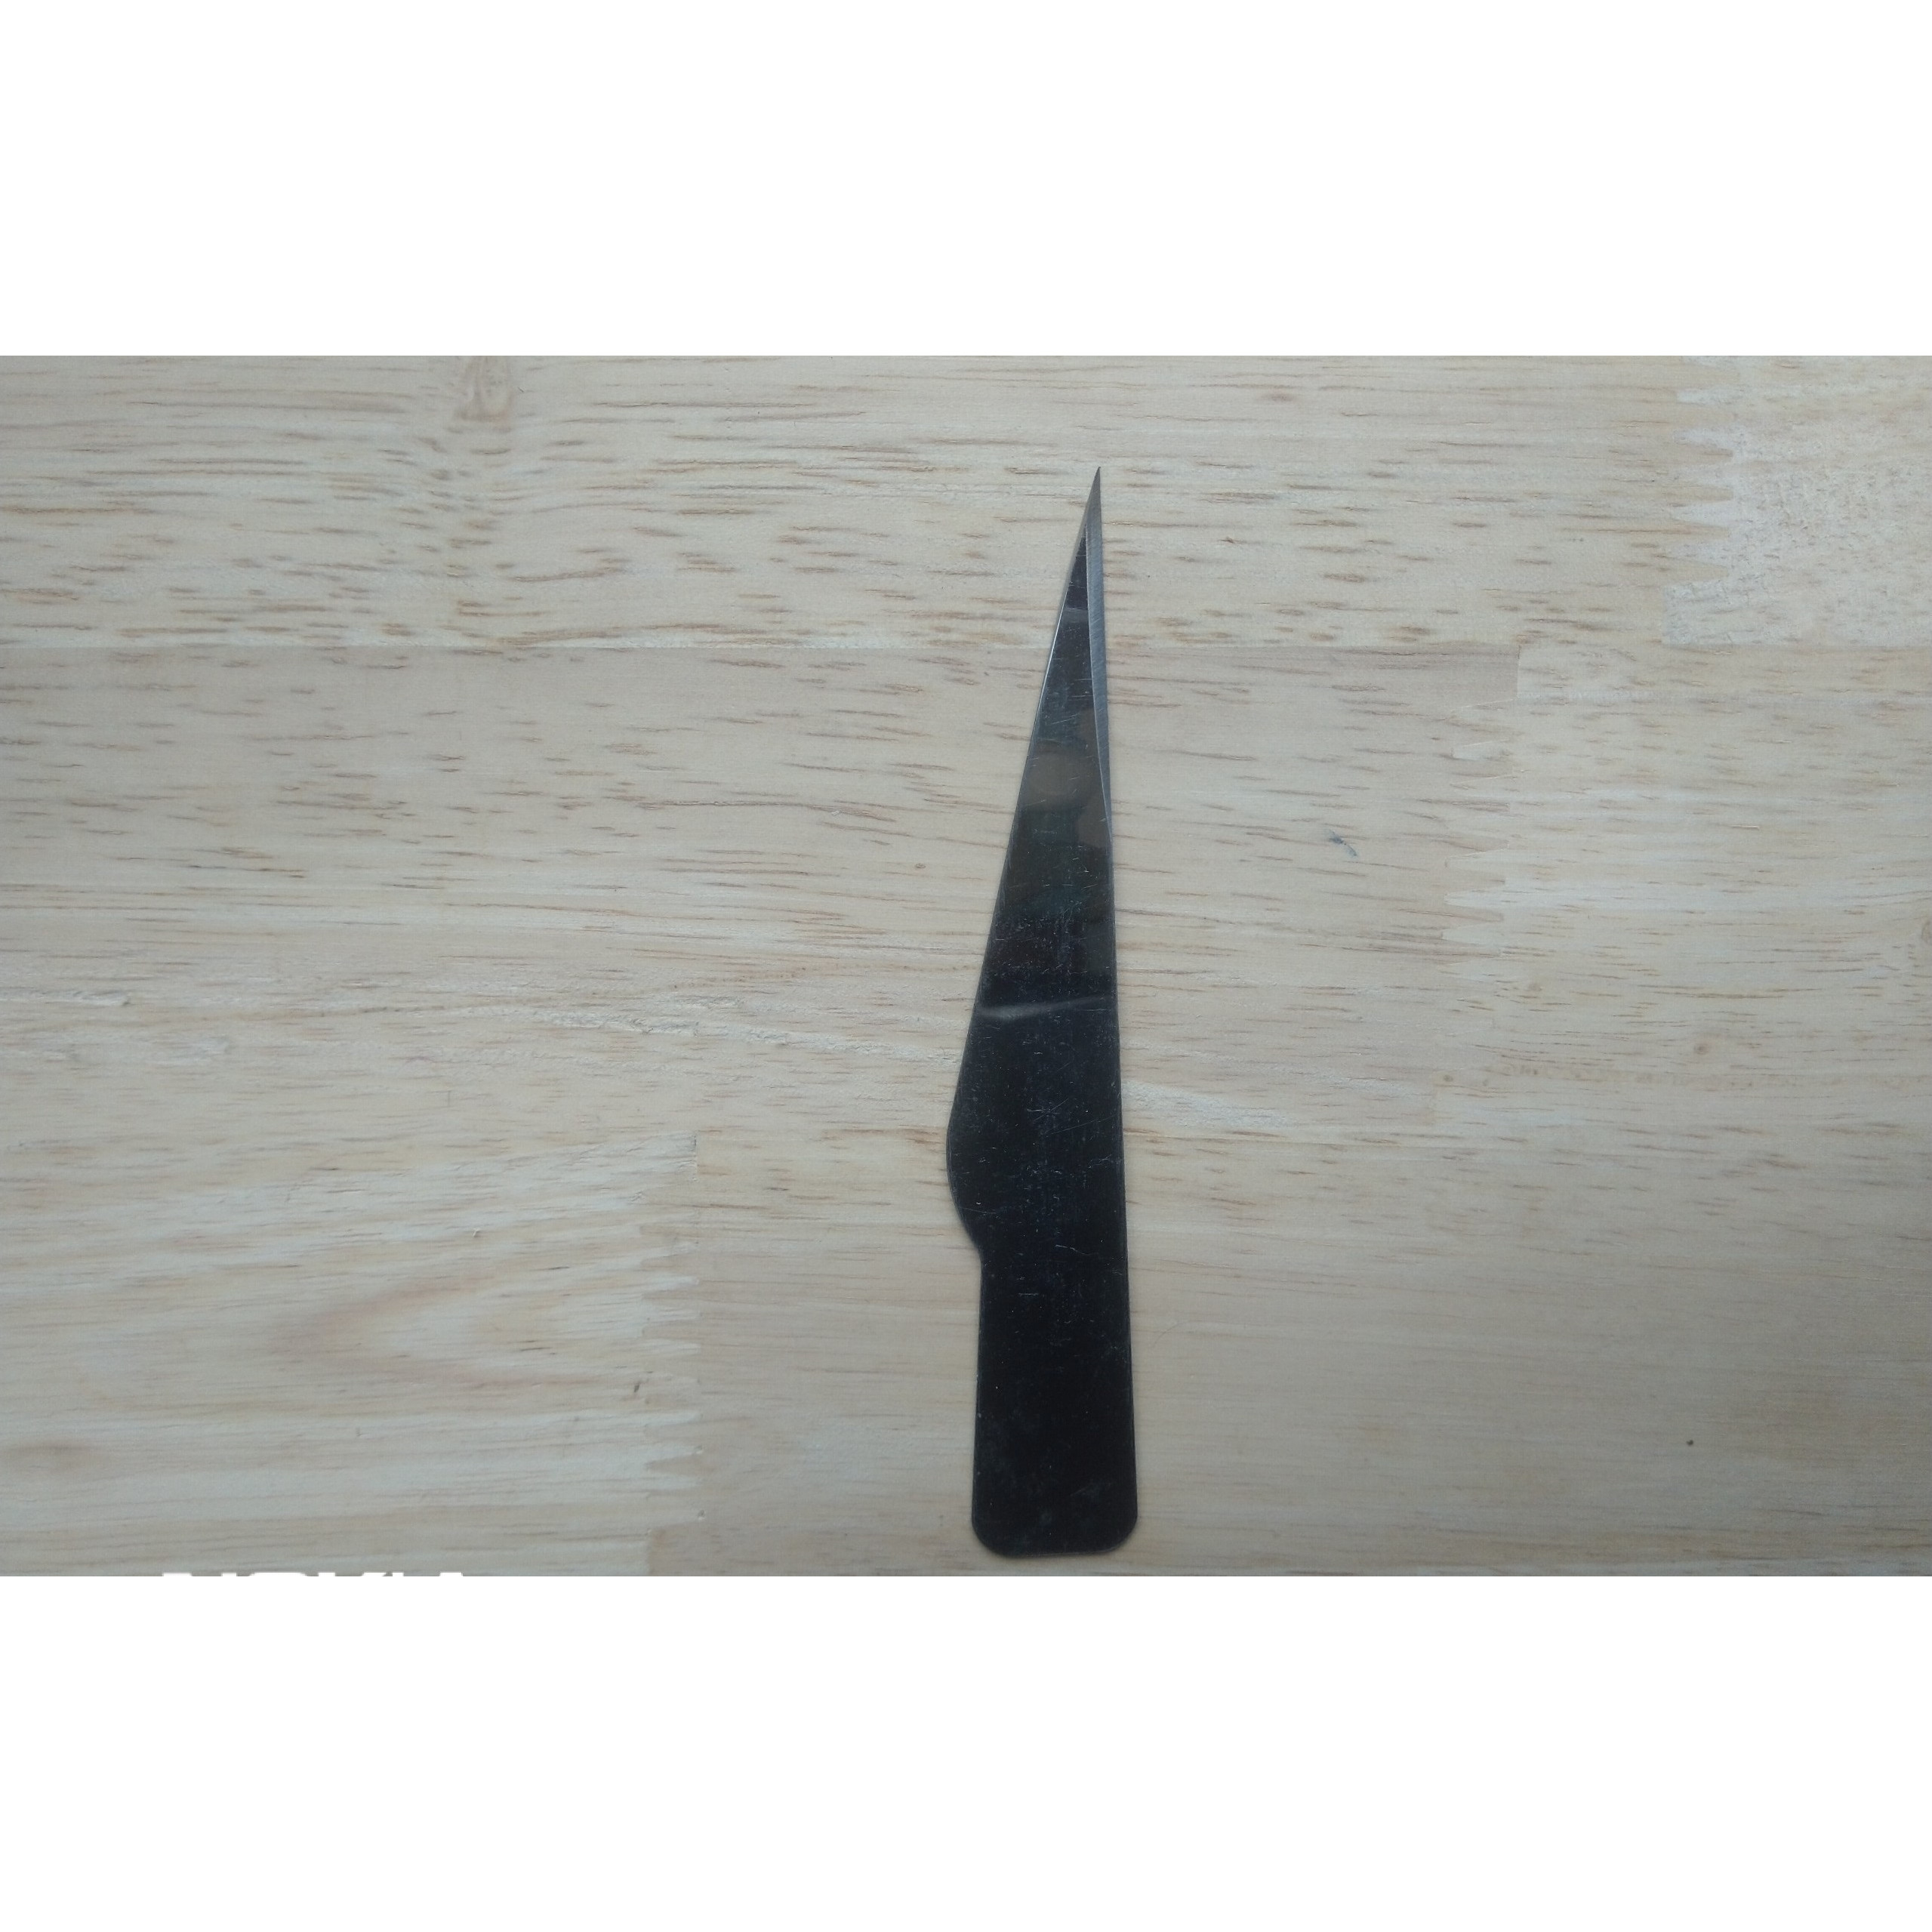 5 Cây dao lột vỏ tôm - 100% Inox 304 - Size M